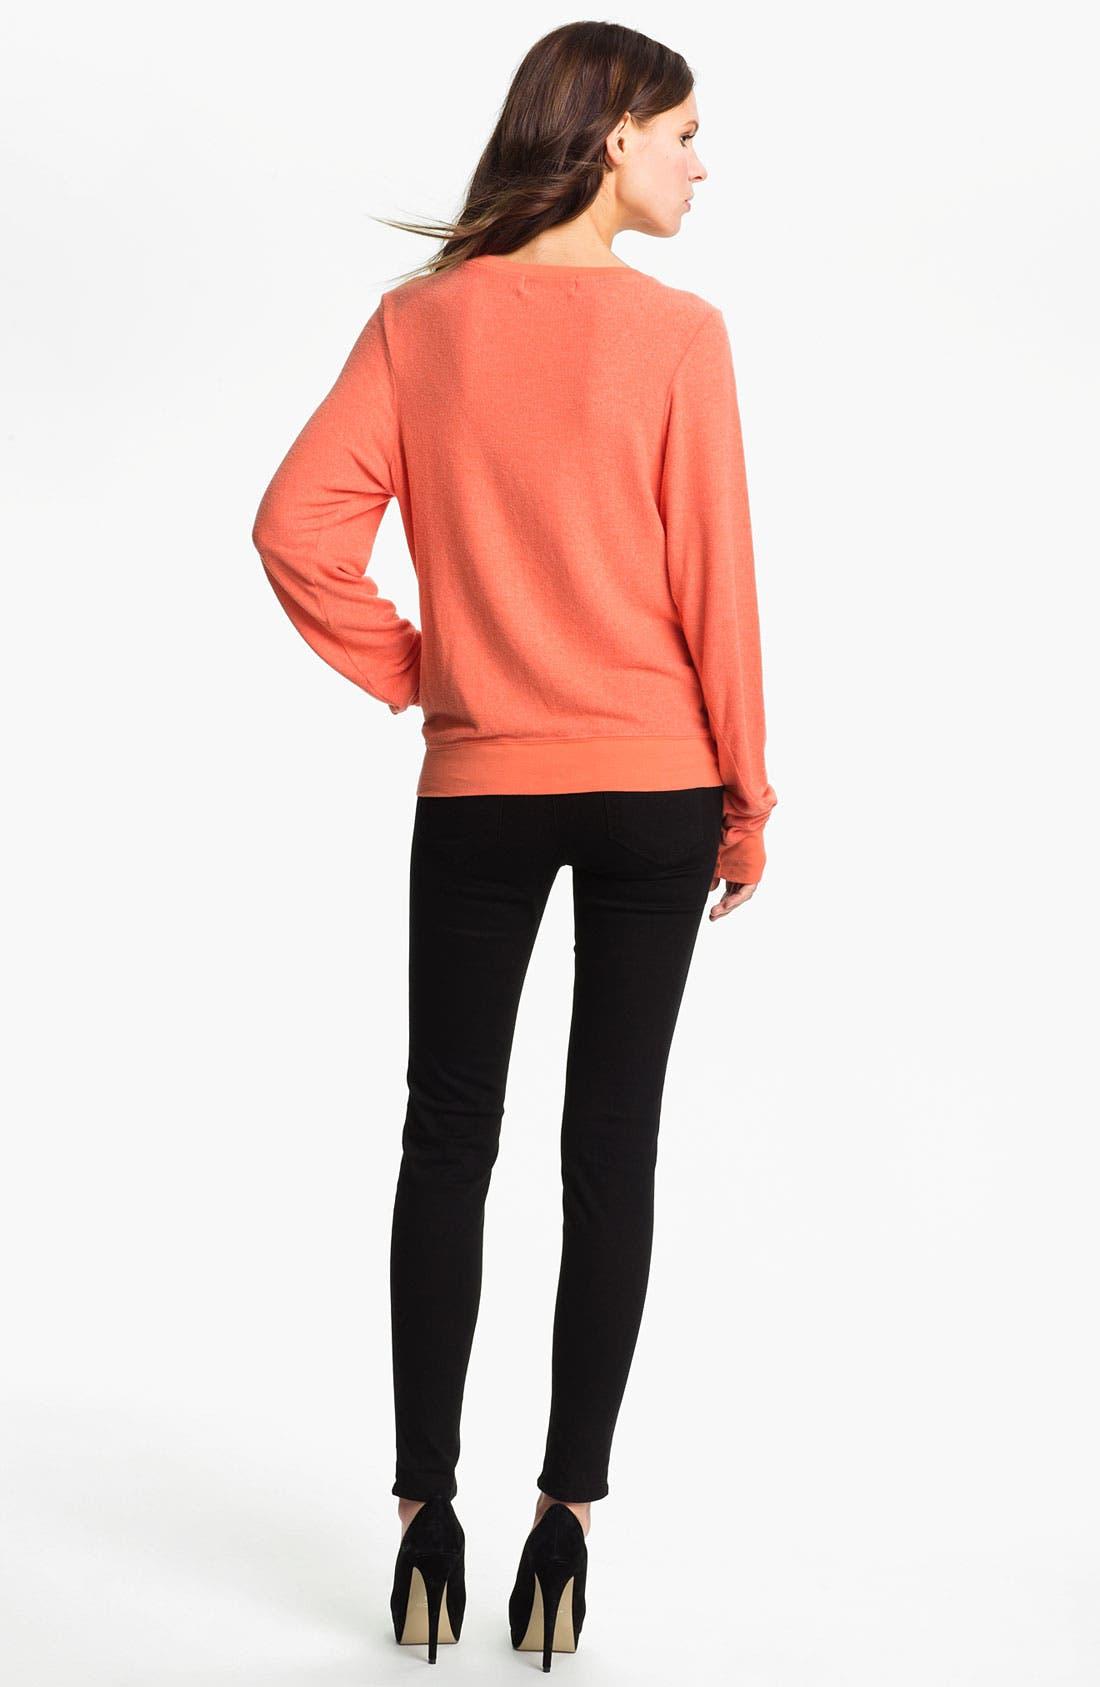 J BRAND Skinny Stretch Jeans, Main, color, 003